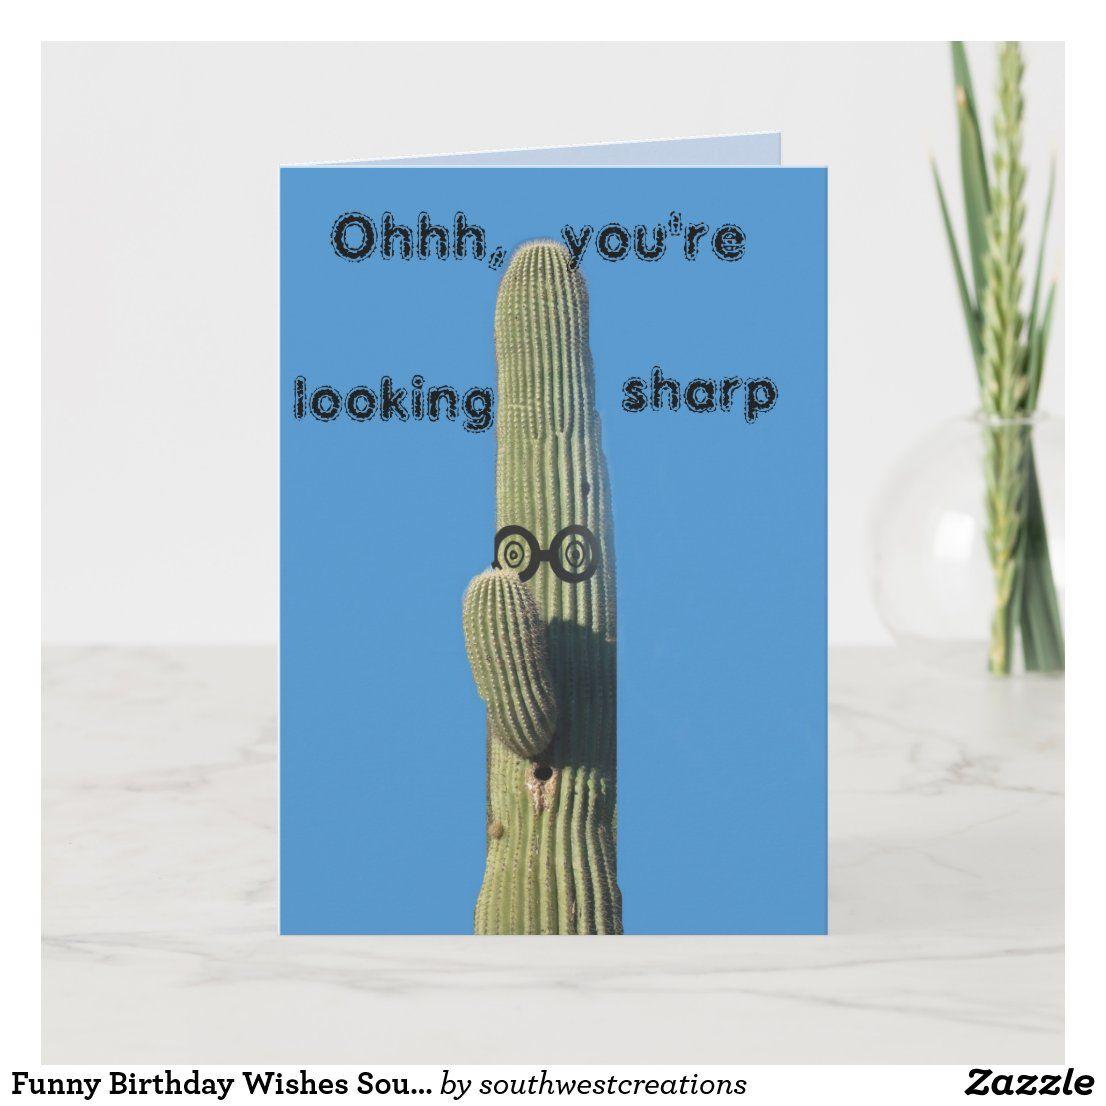 Funny birthday wishes southwest saguaro cactus card